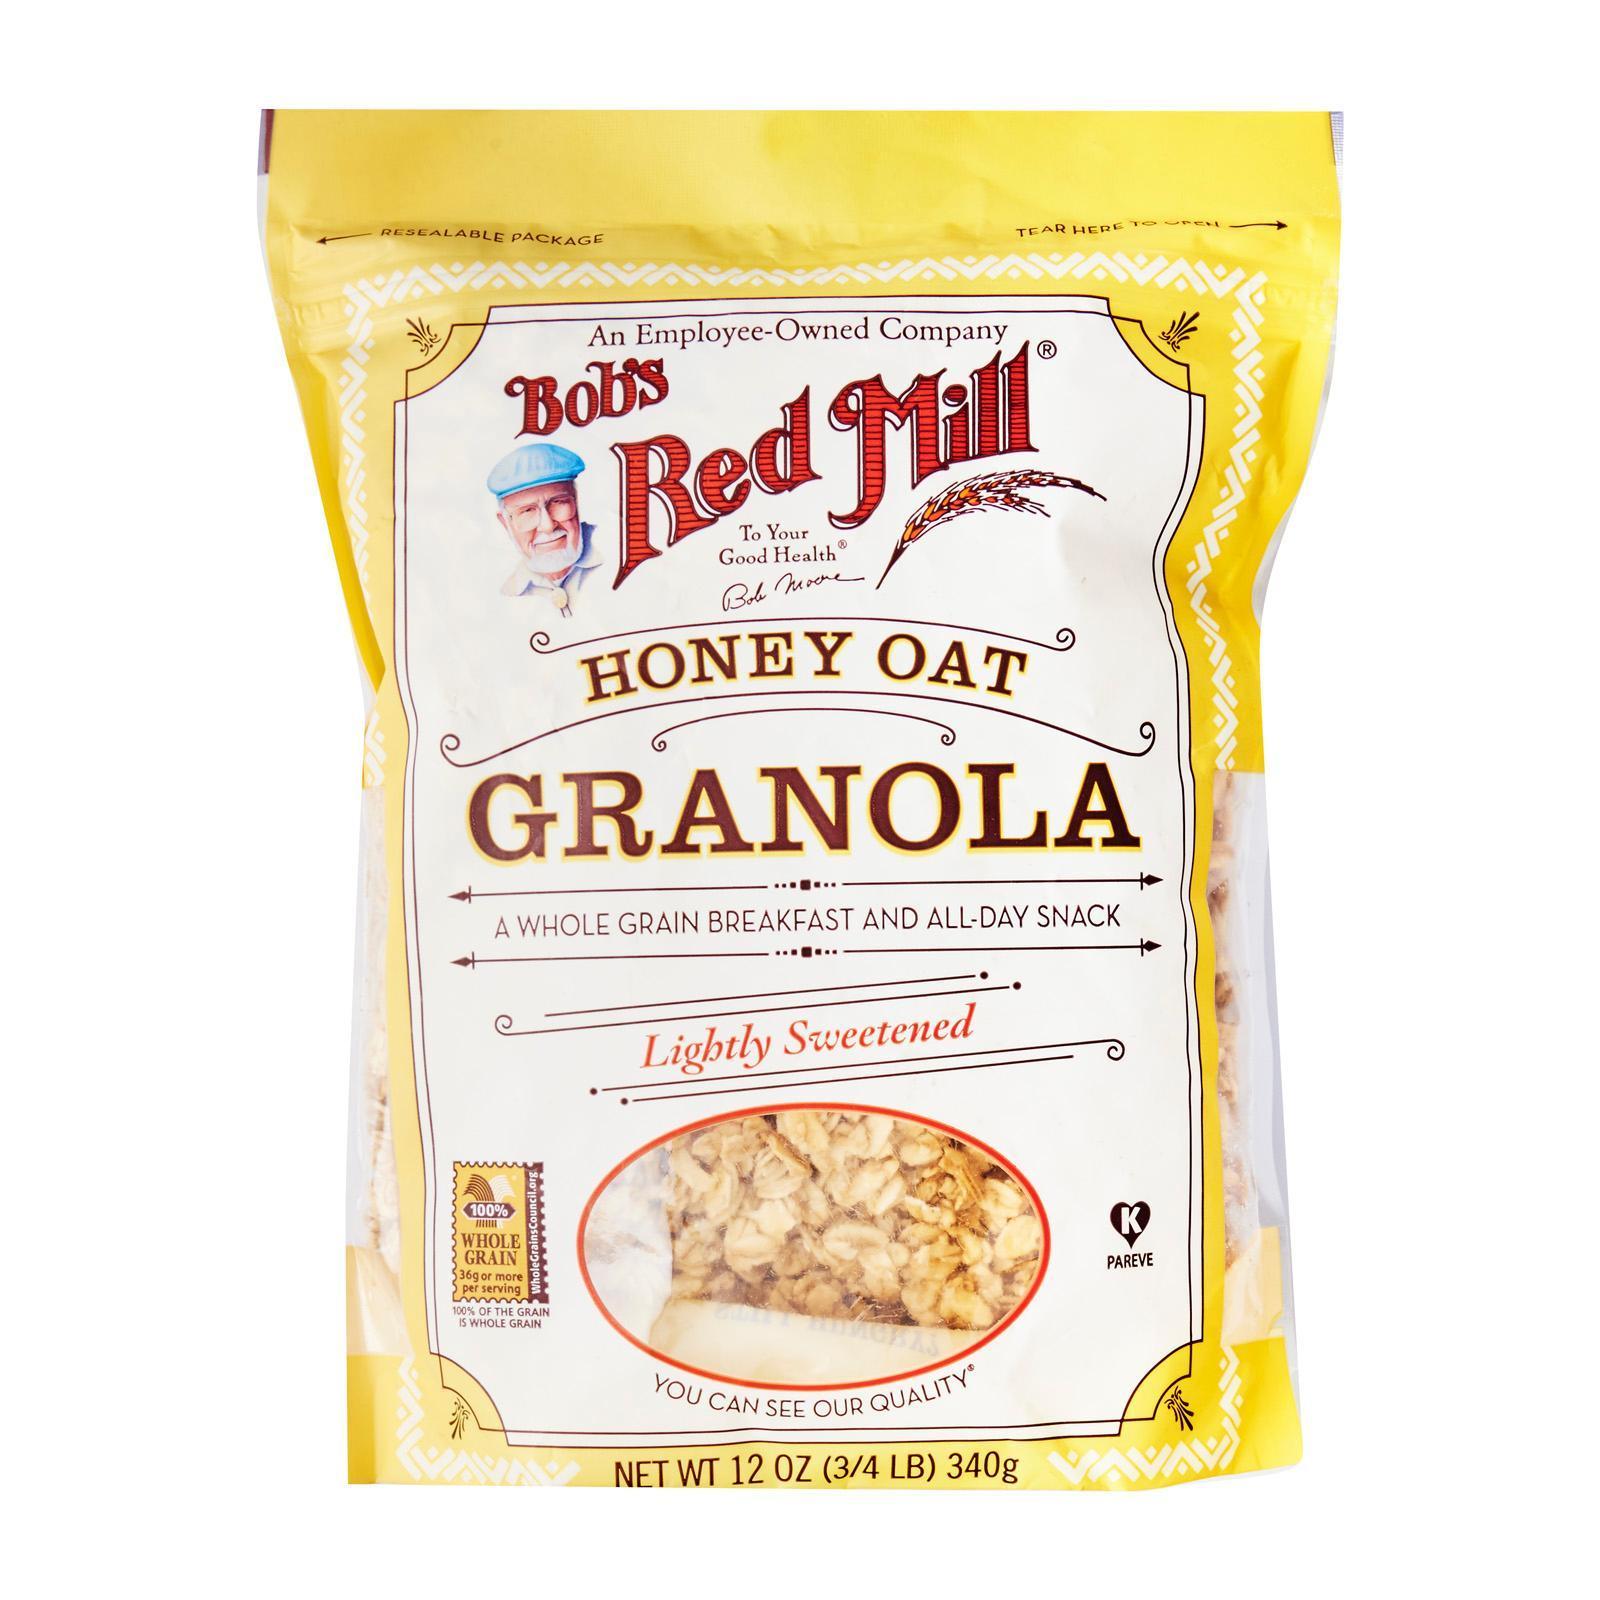 Bob's Red Mill Whole Grain Honey Oat Granola Lightly Sweetened